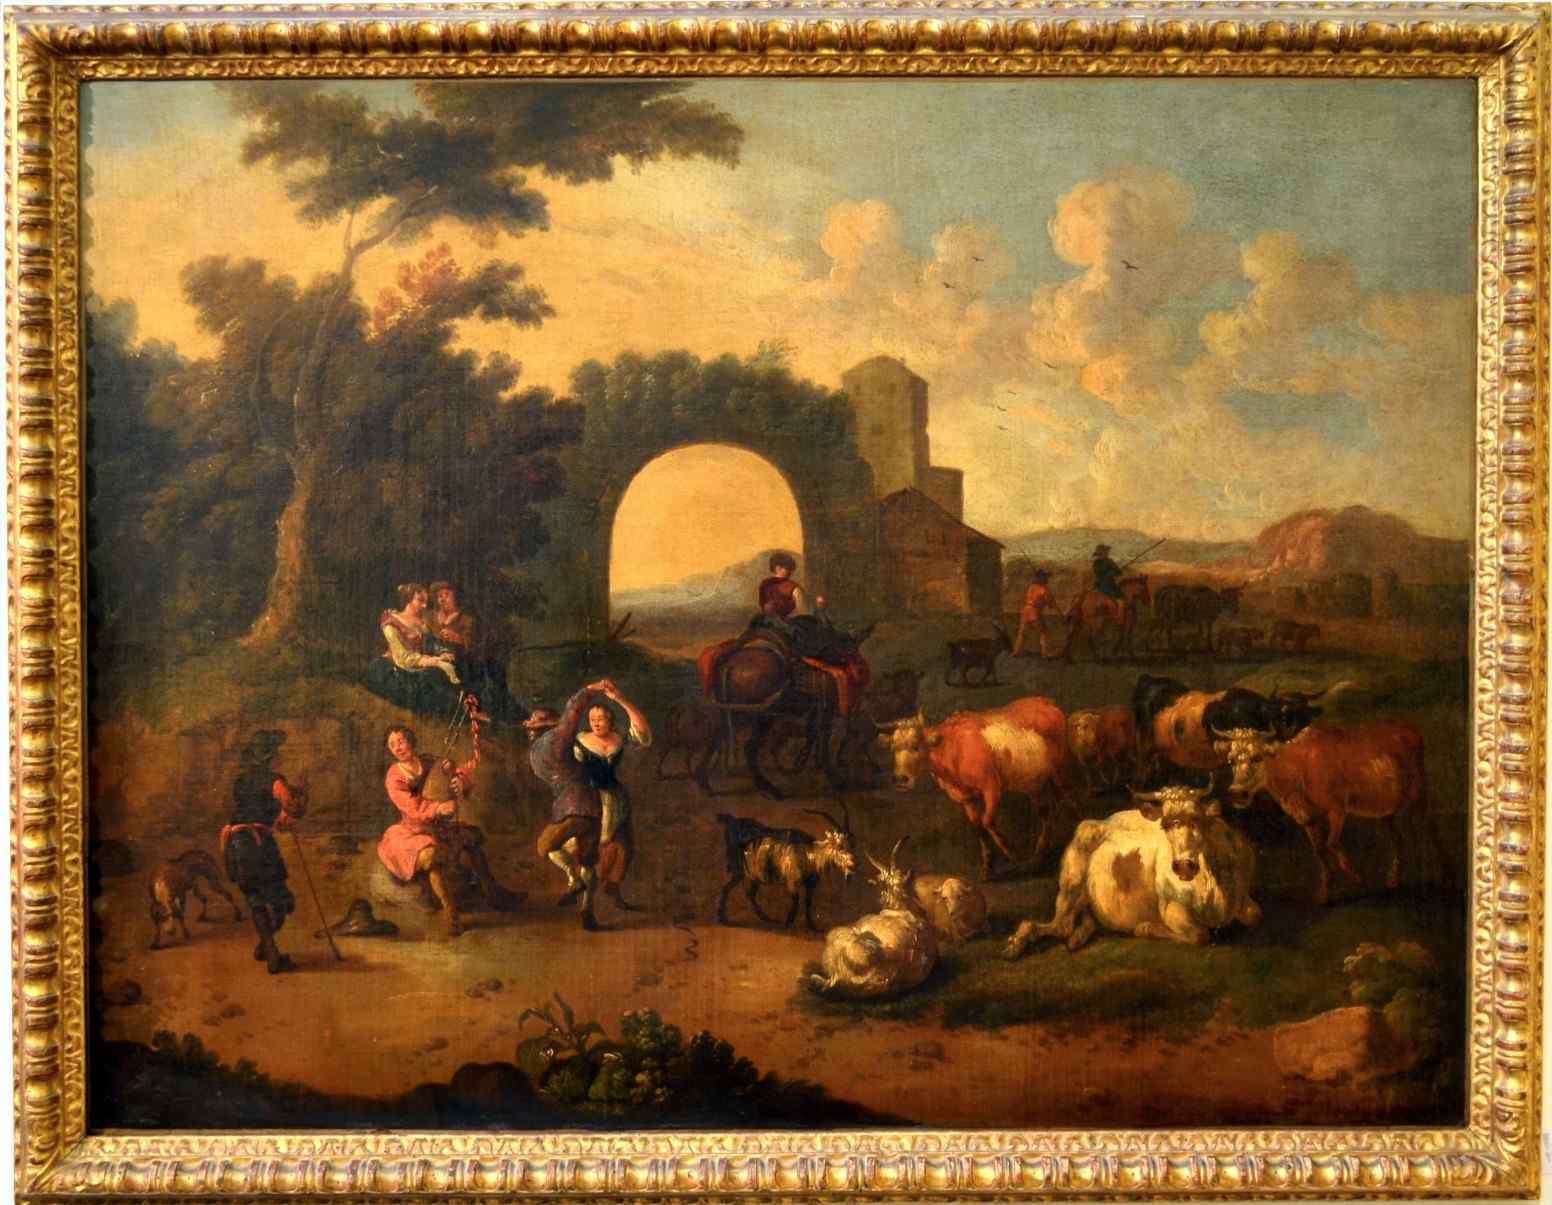 Michelangelo Cerquozzi (Roma 1602 - 1660) bott, Festa rurale